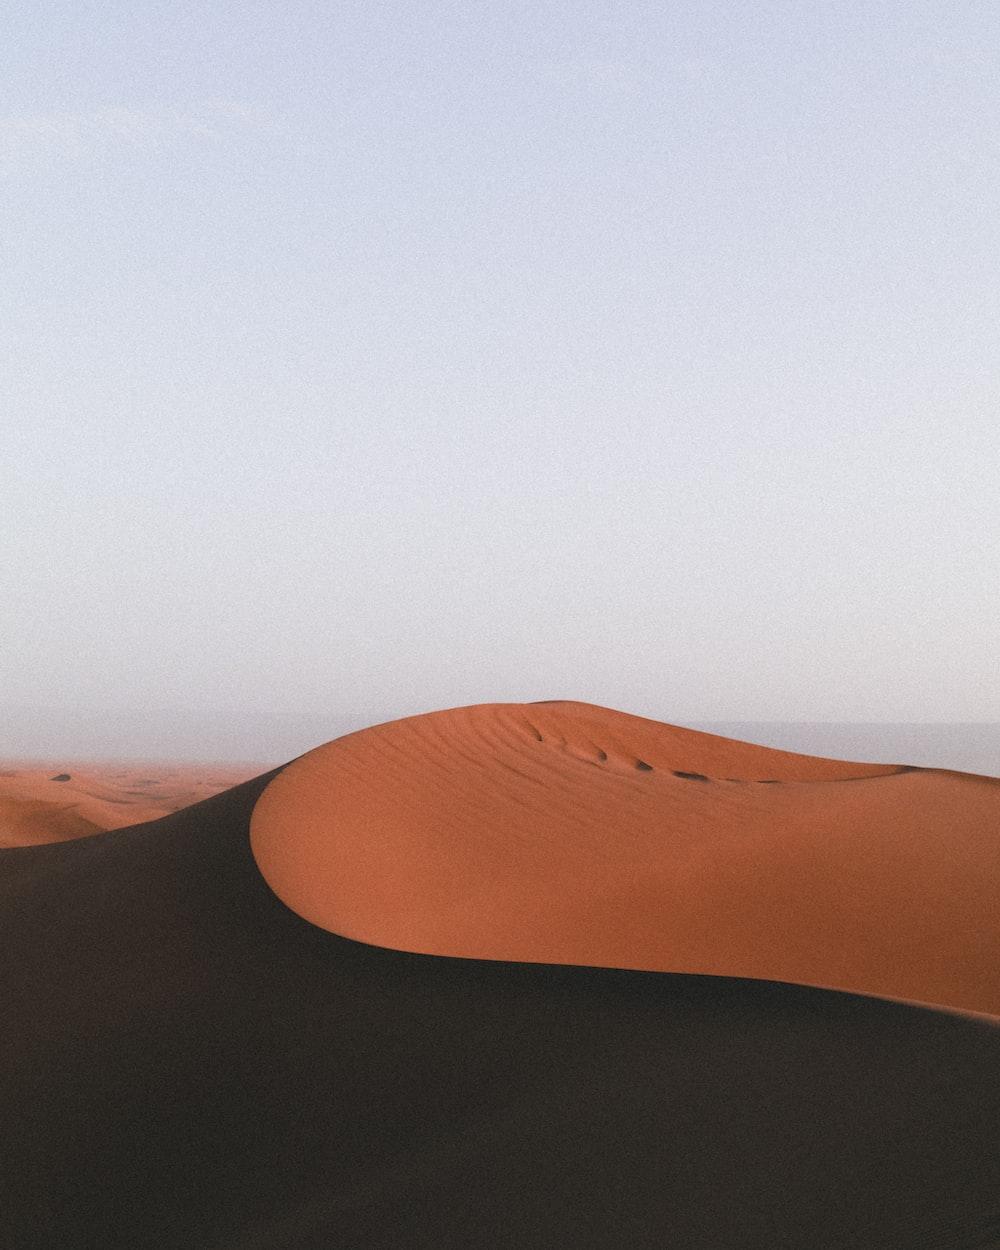 brown sand beach during daytime